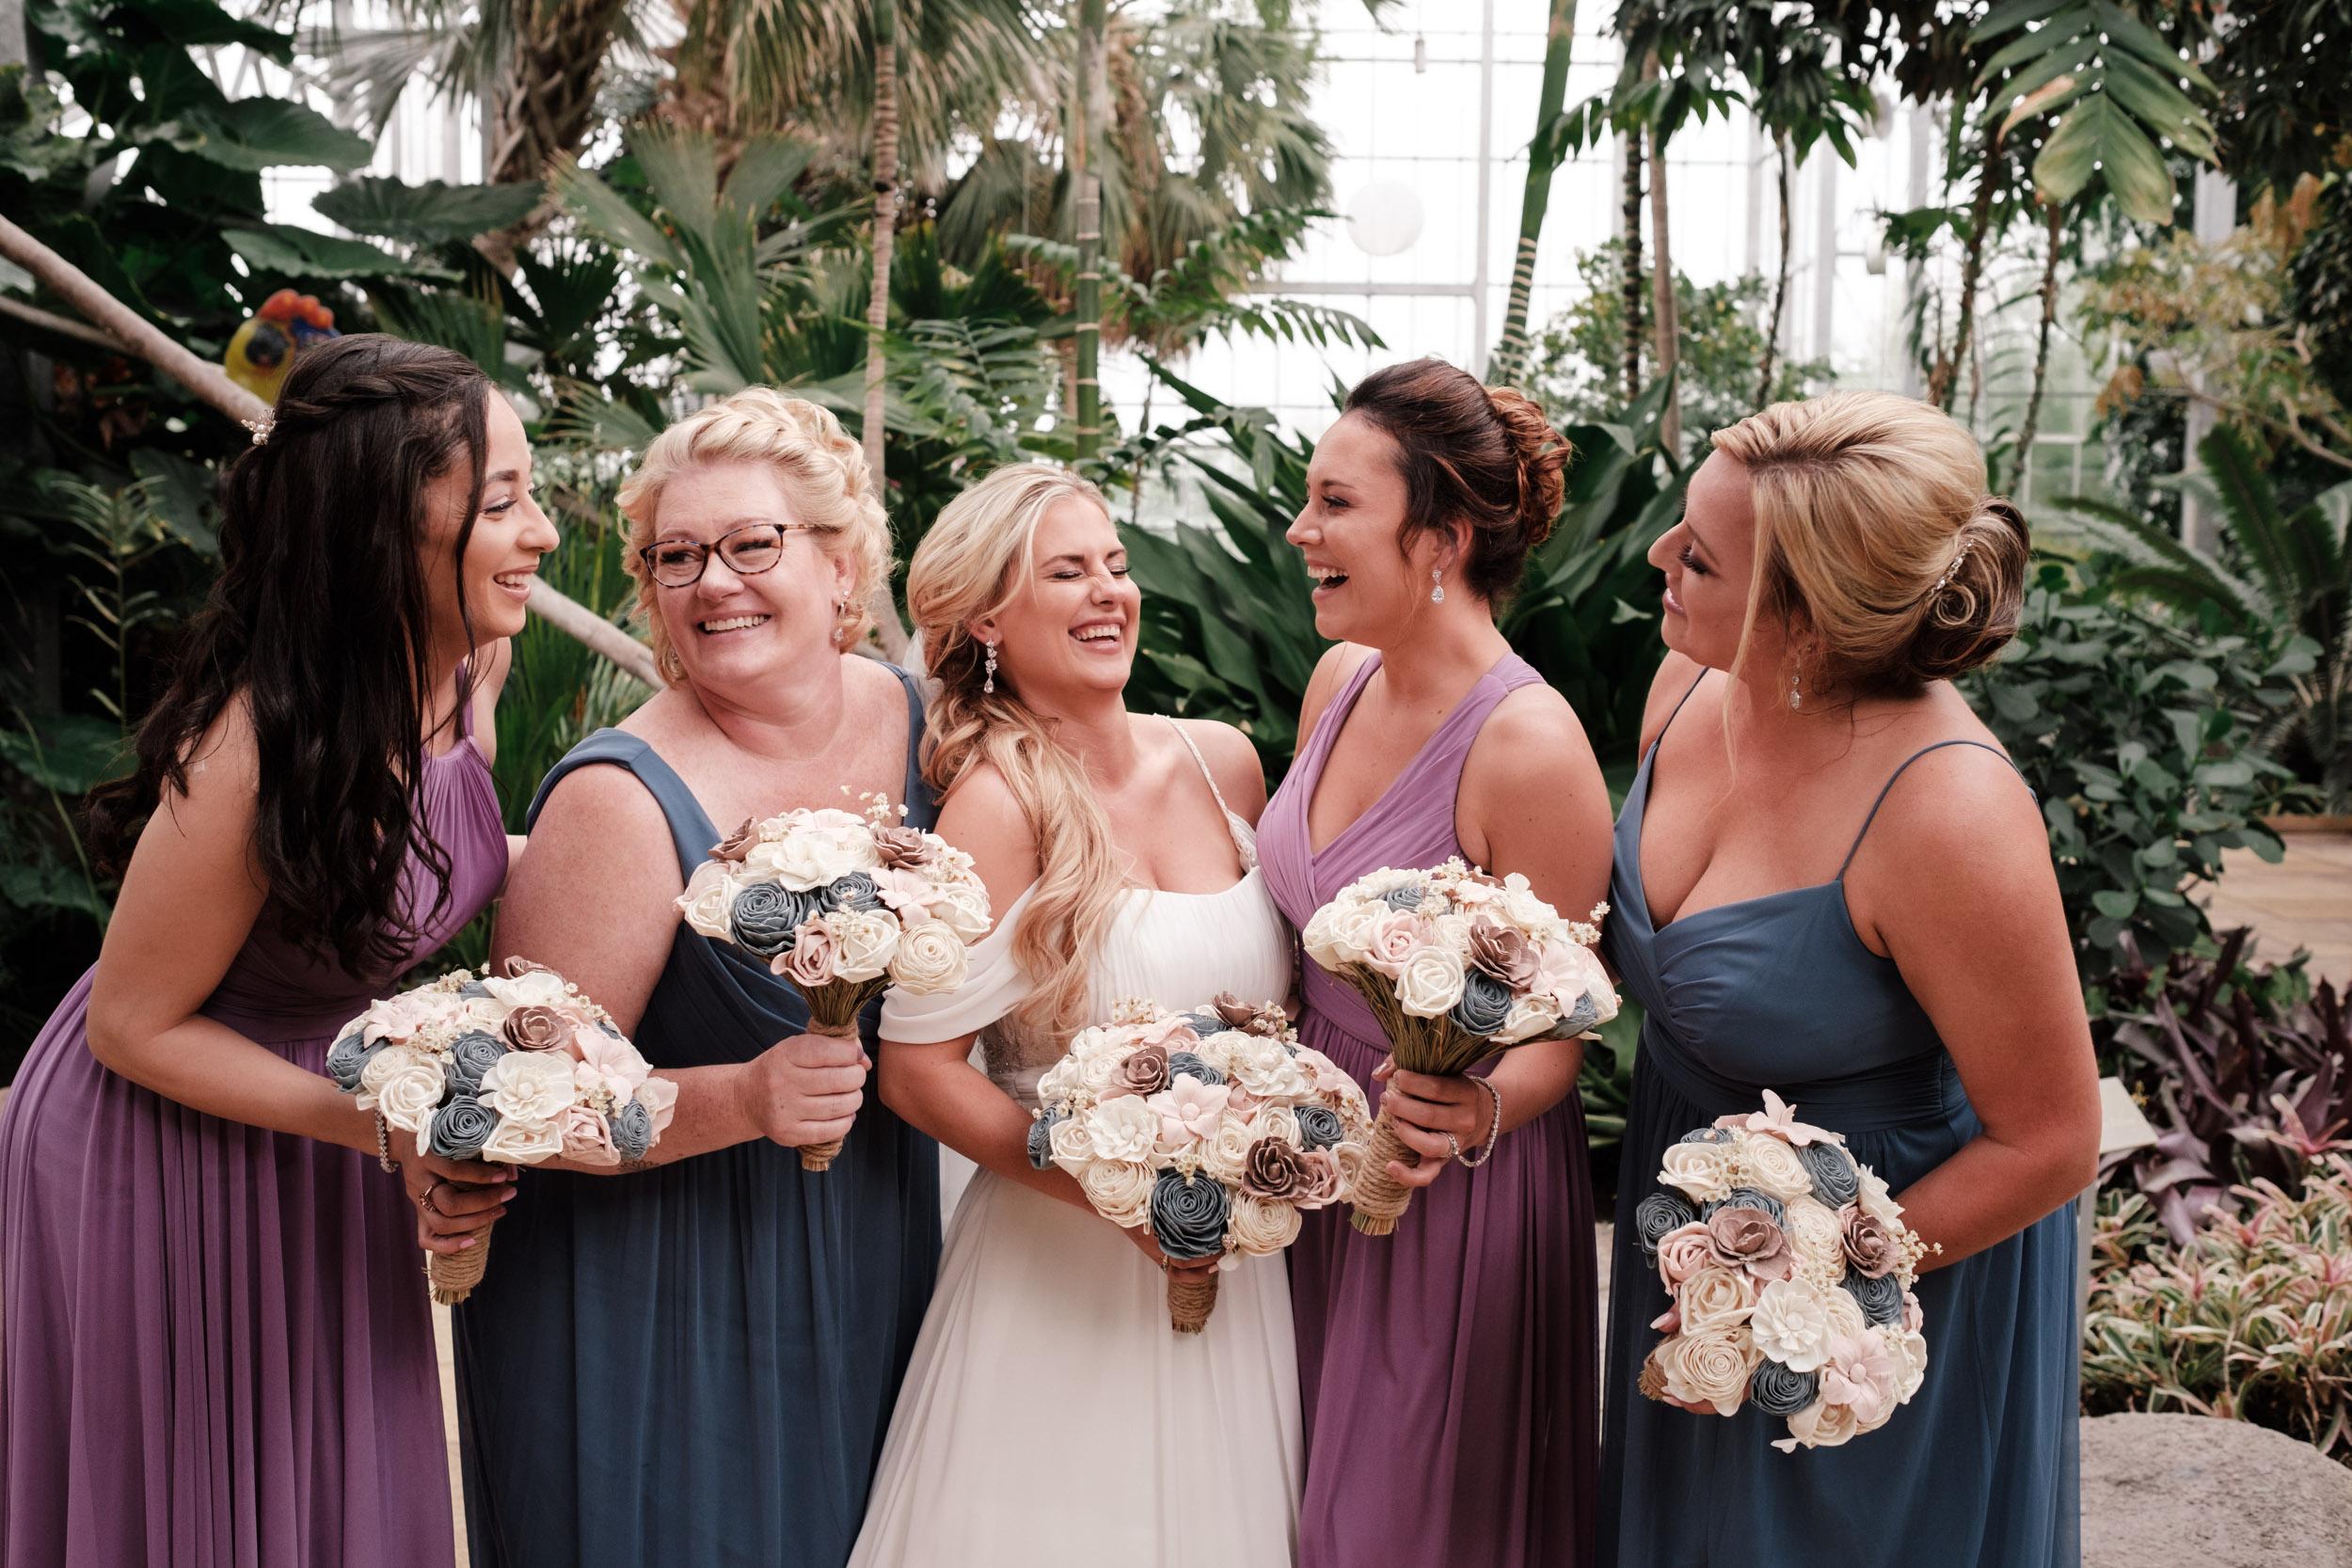 19-06-01 Megan Josh - Nicholas Conservatory Wedding-26.jpg